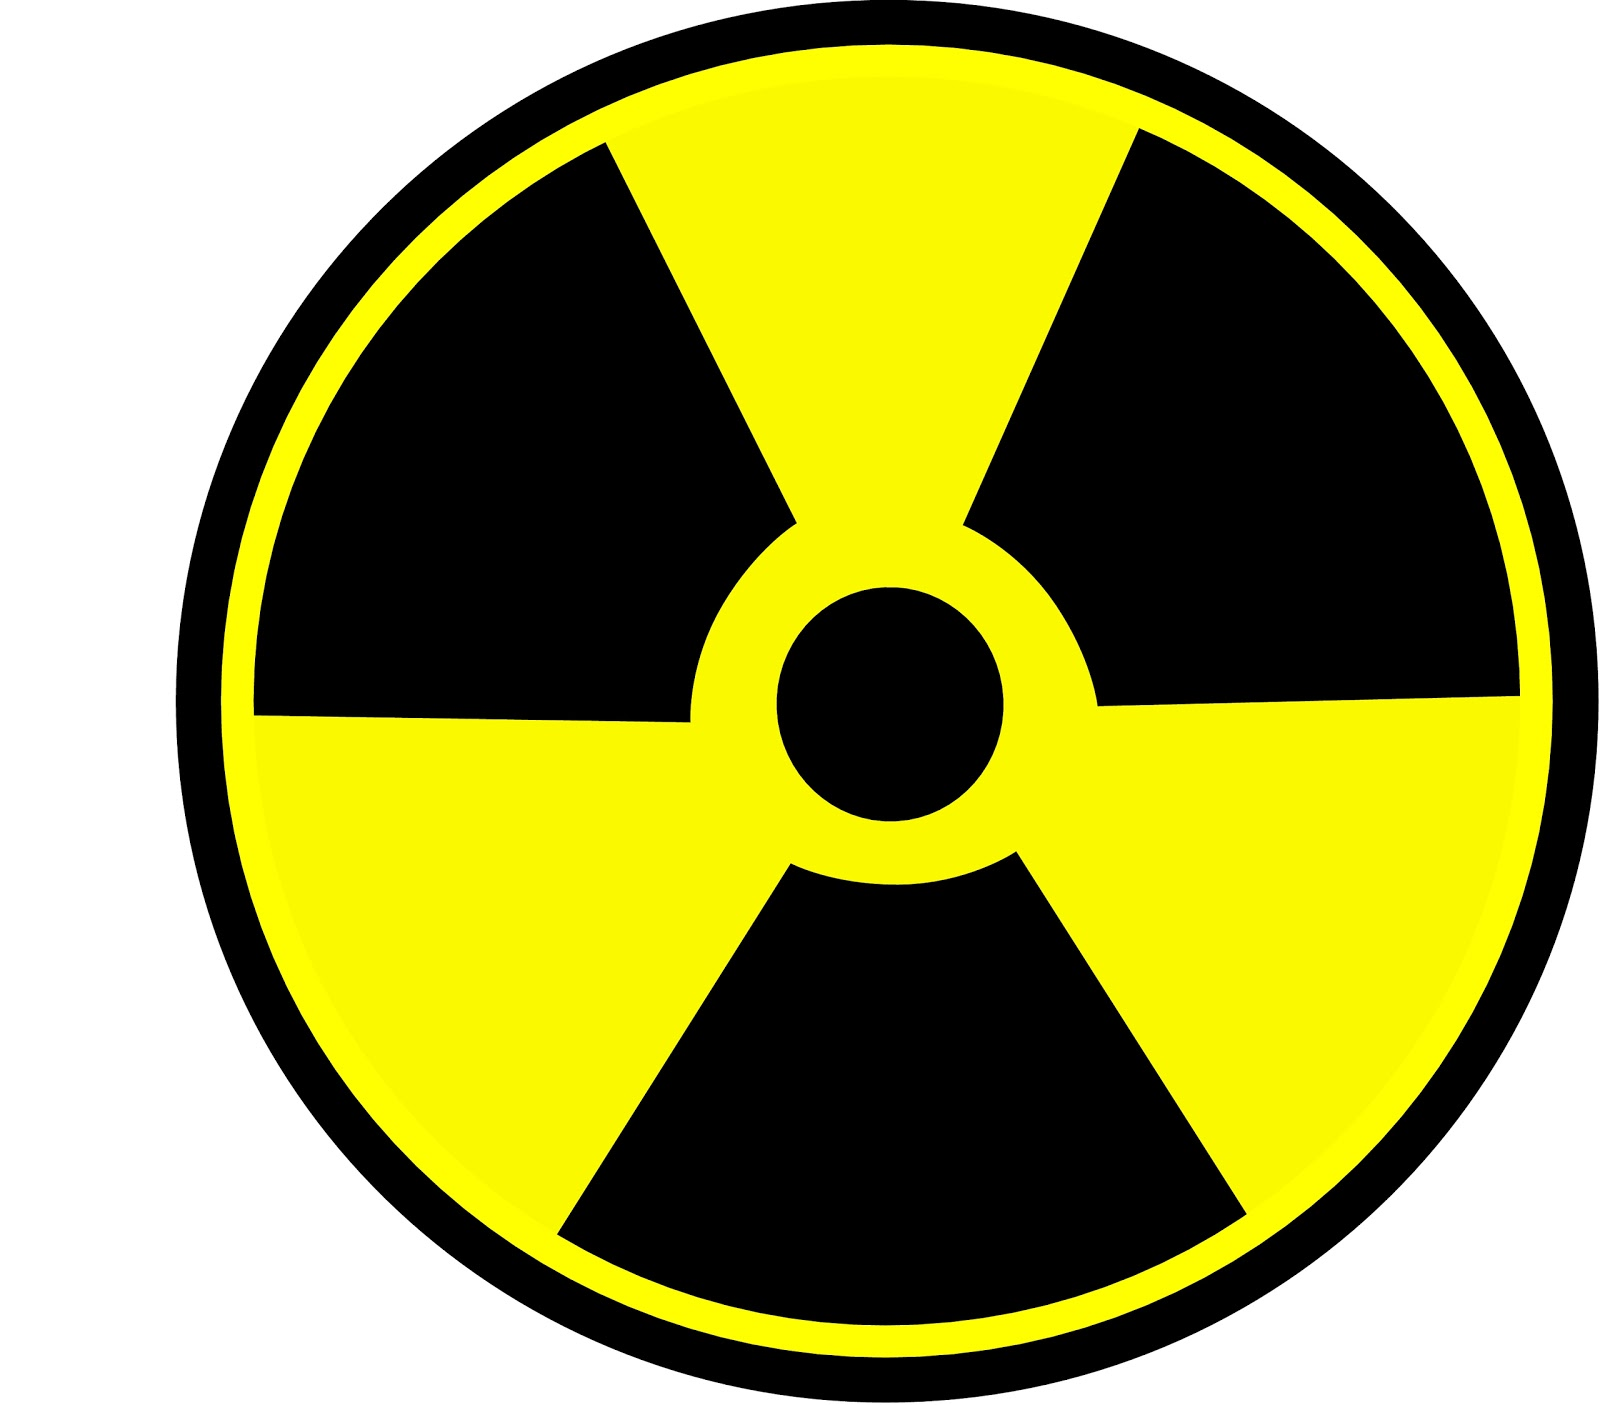 Radiation Hazard Symbol HD Wallpaper Desktop Wallpapers 1600x1405